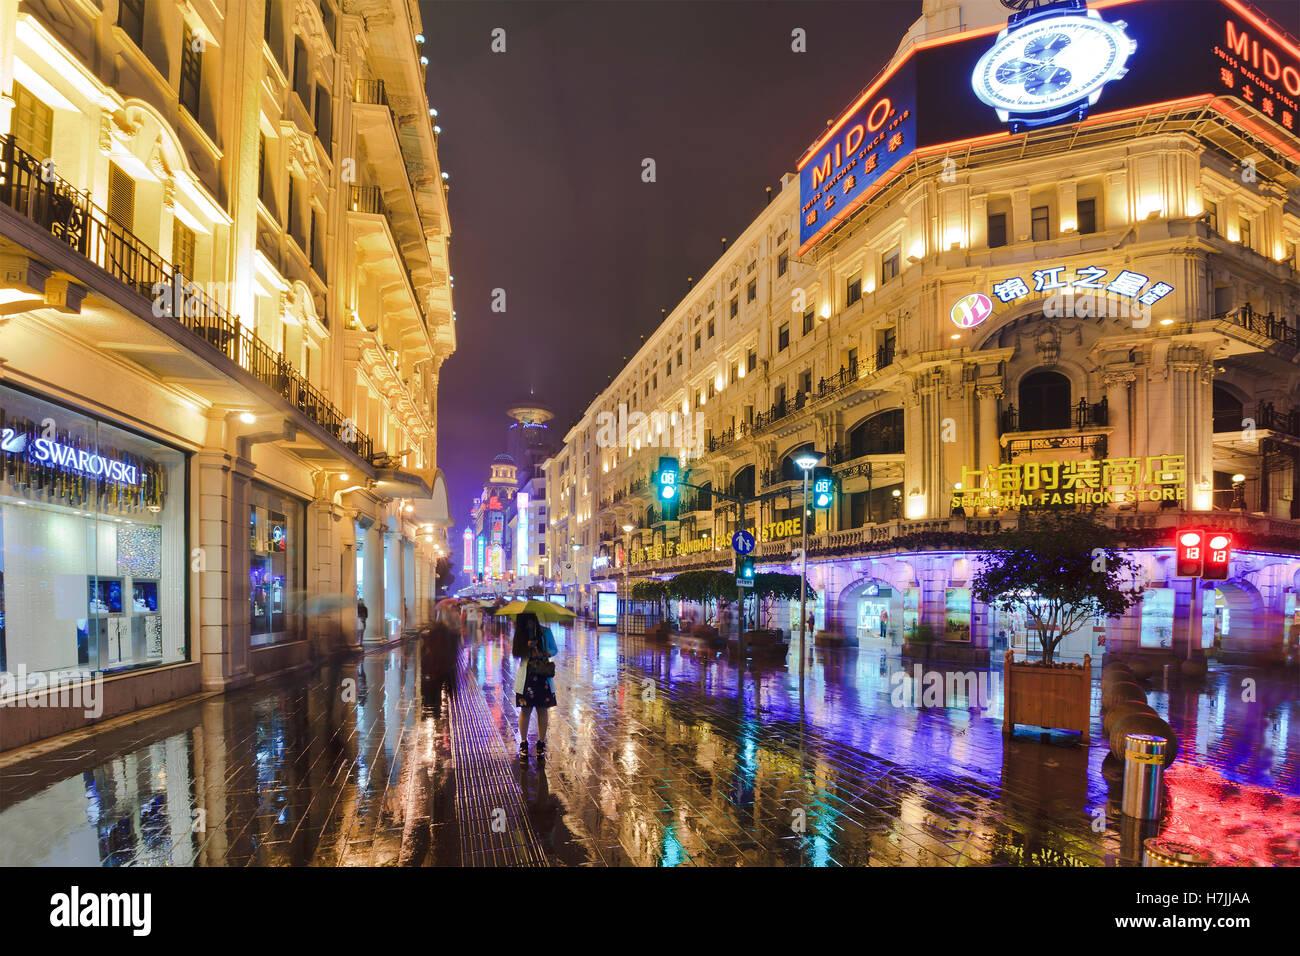 SHANGHAI, CN - OCT 31, 2014: Architecture of Nanjing Road - the main shopping street of Shanghai, China at night - Stock Image